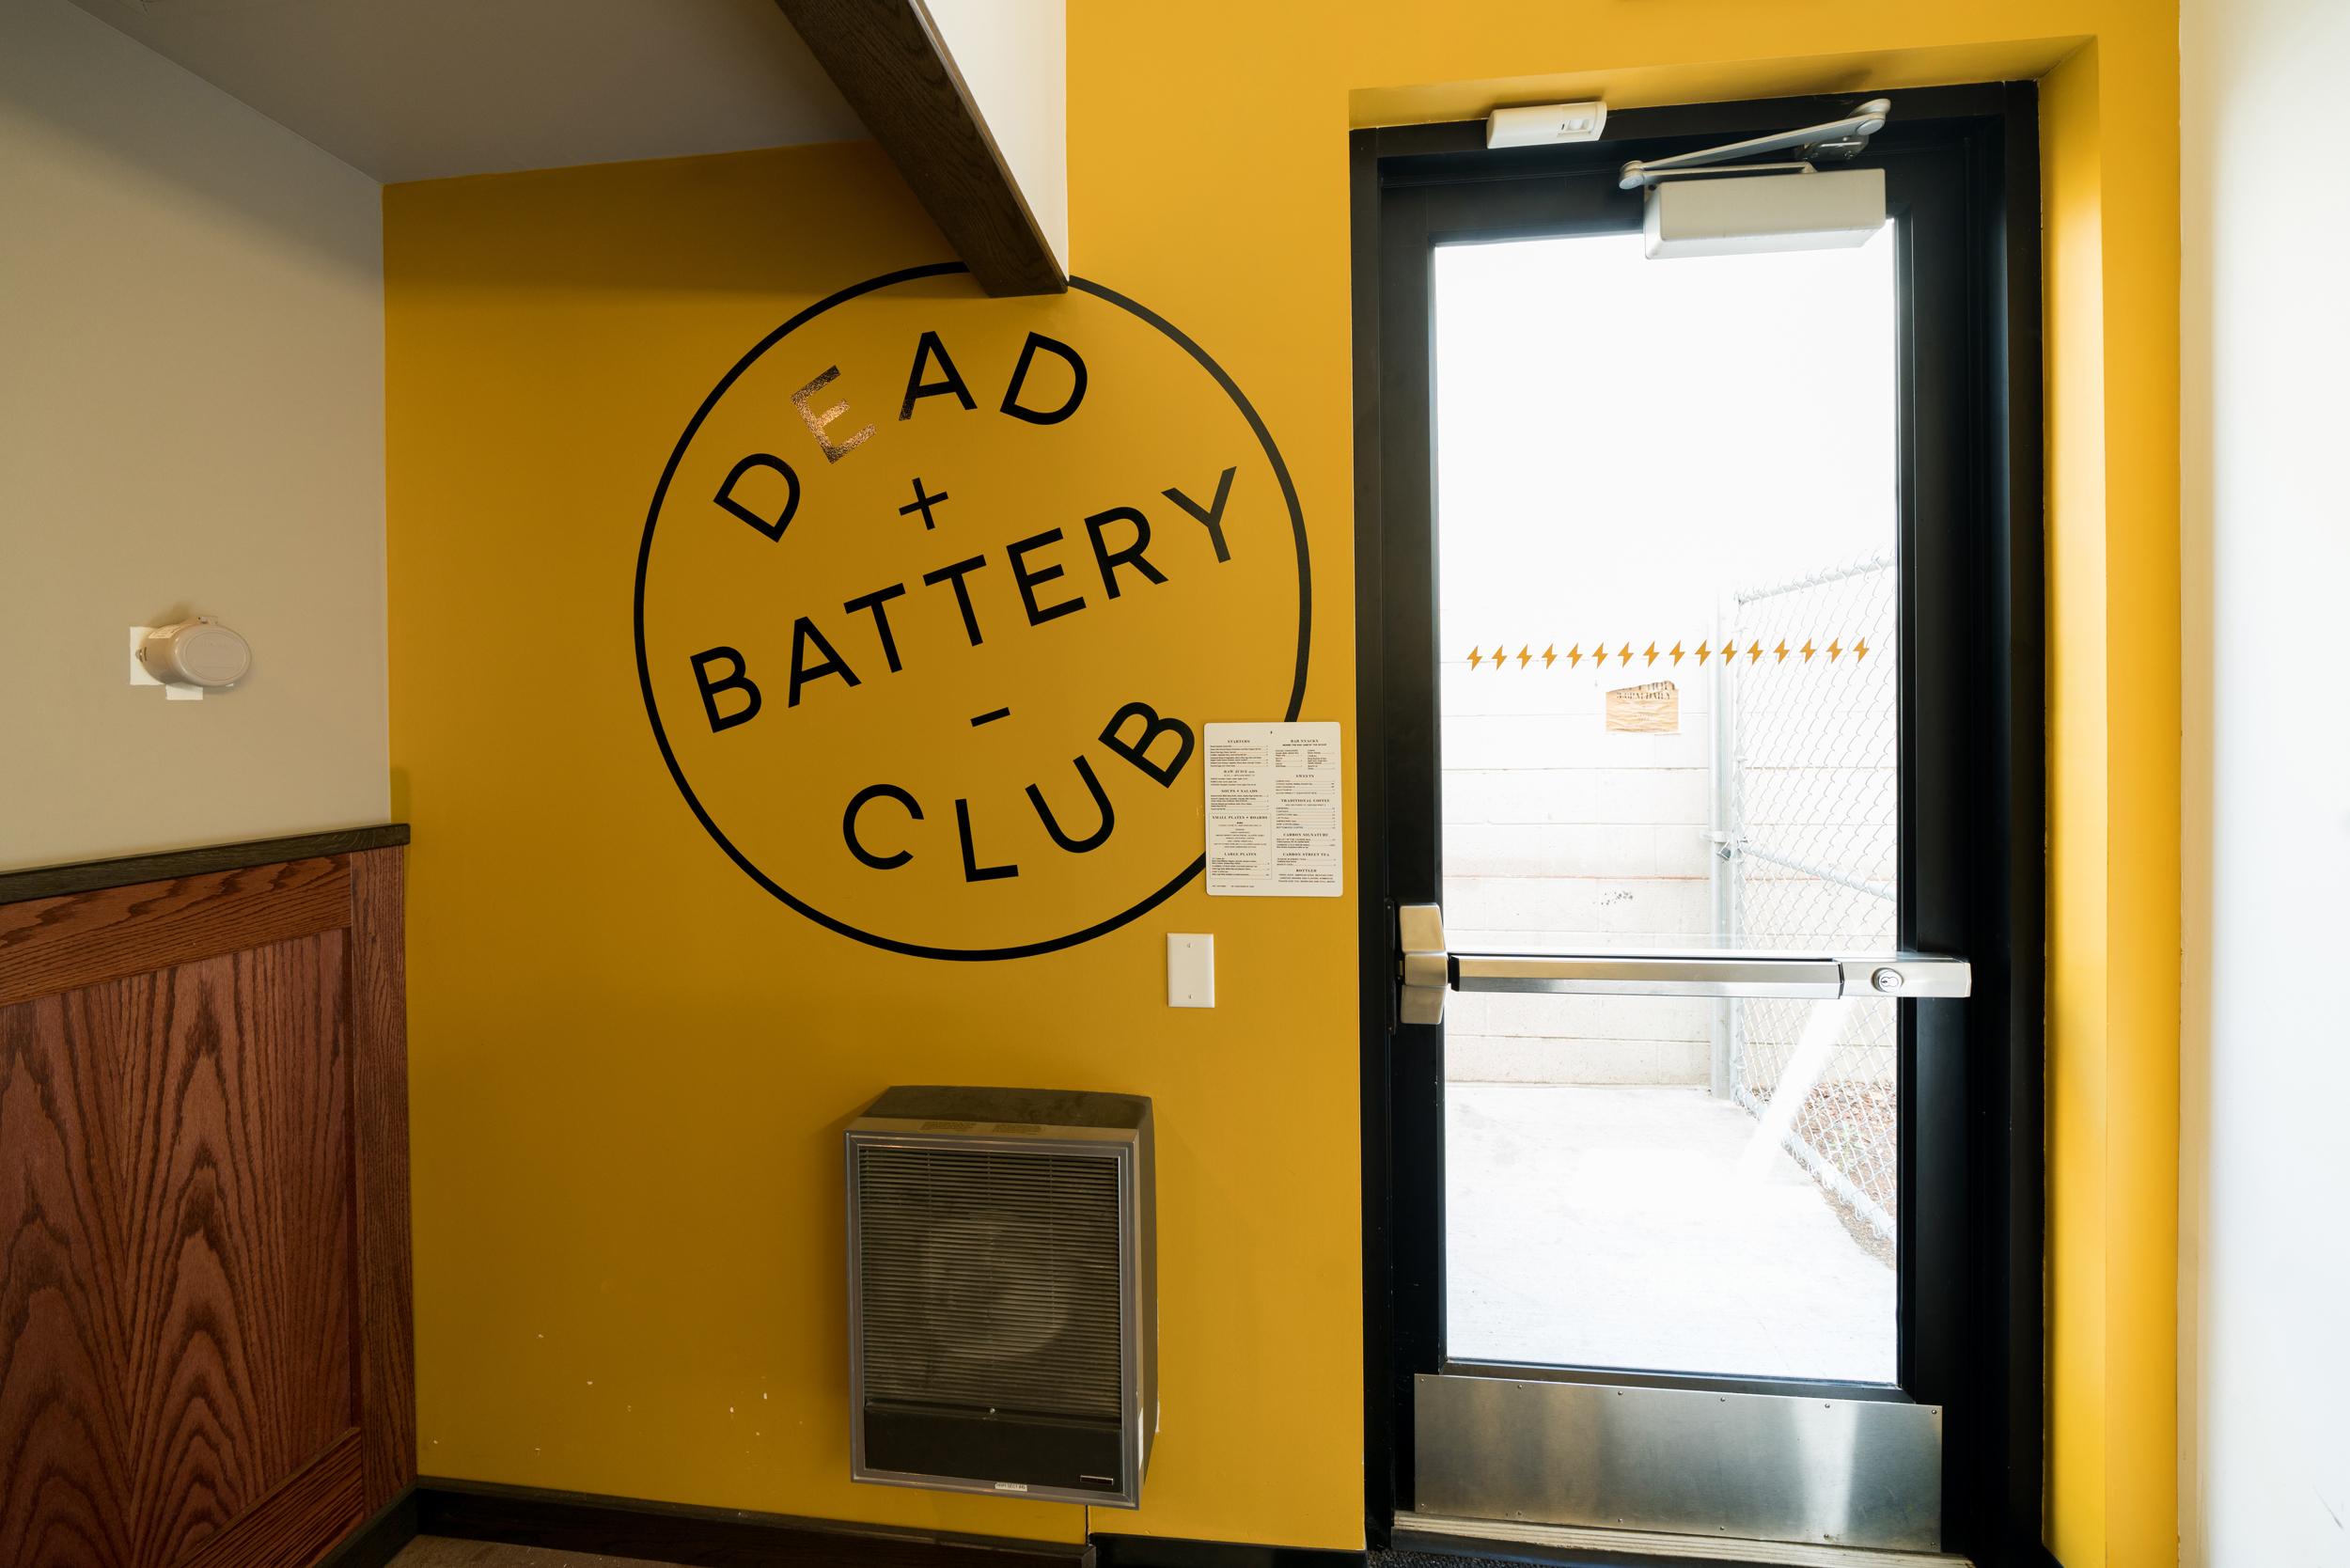 8020-builders-dead-battery-club-19.jpg